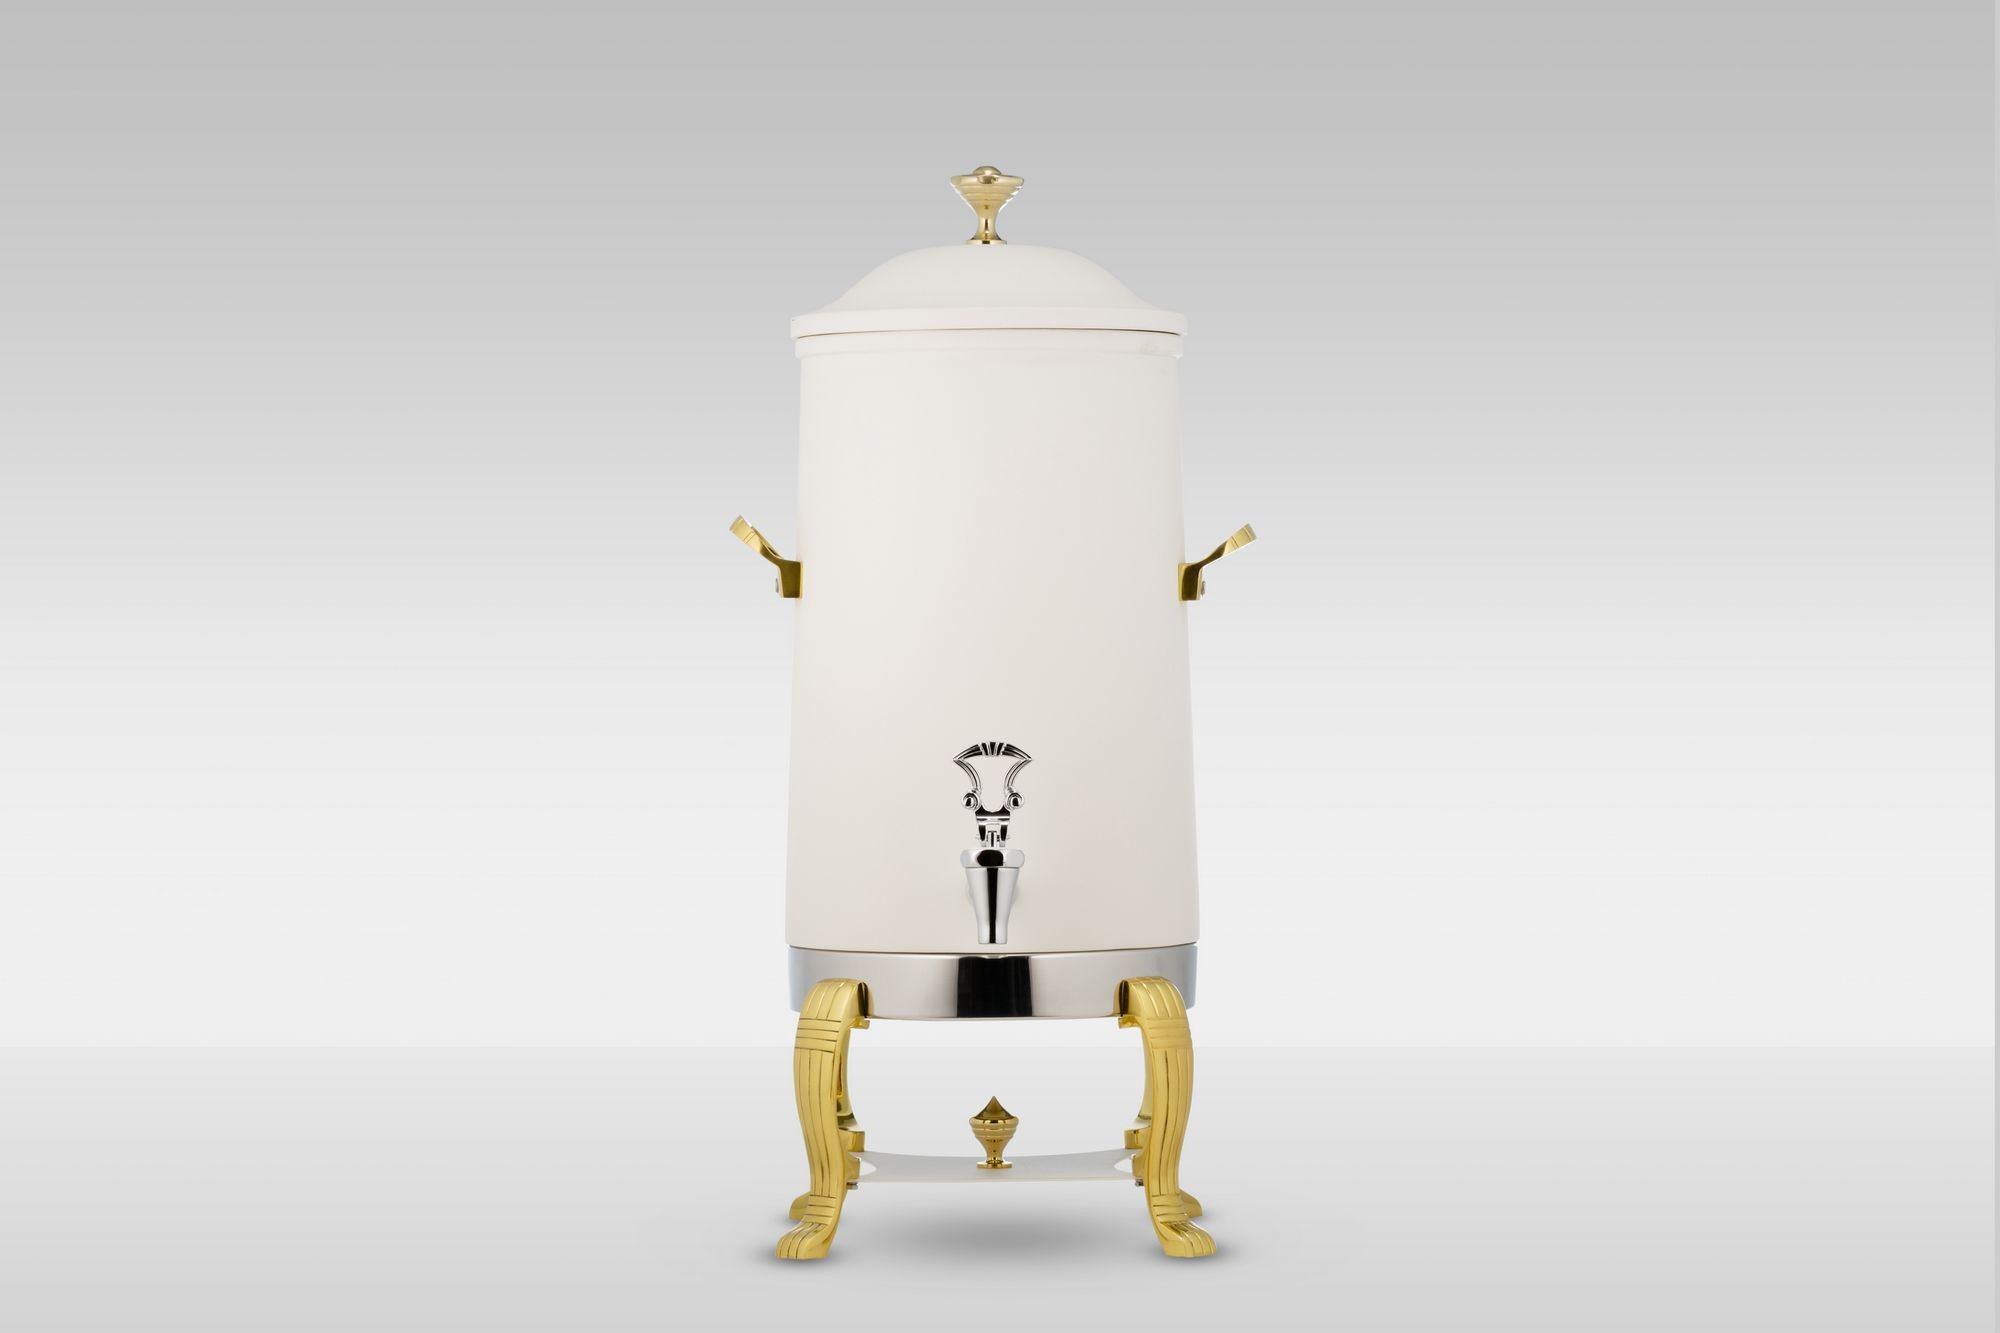 Bon Chef 40003-Nero Aurora Insulated Coffee Urn with Brass Trim,  Nero Finish, 3 Gallon